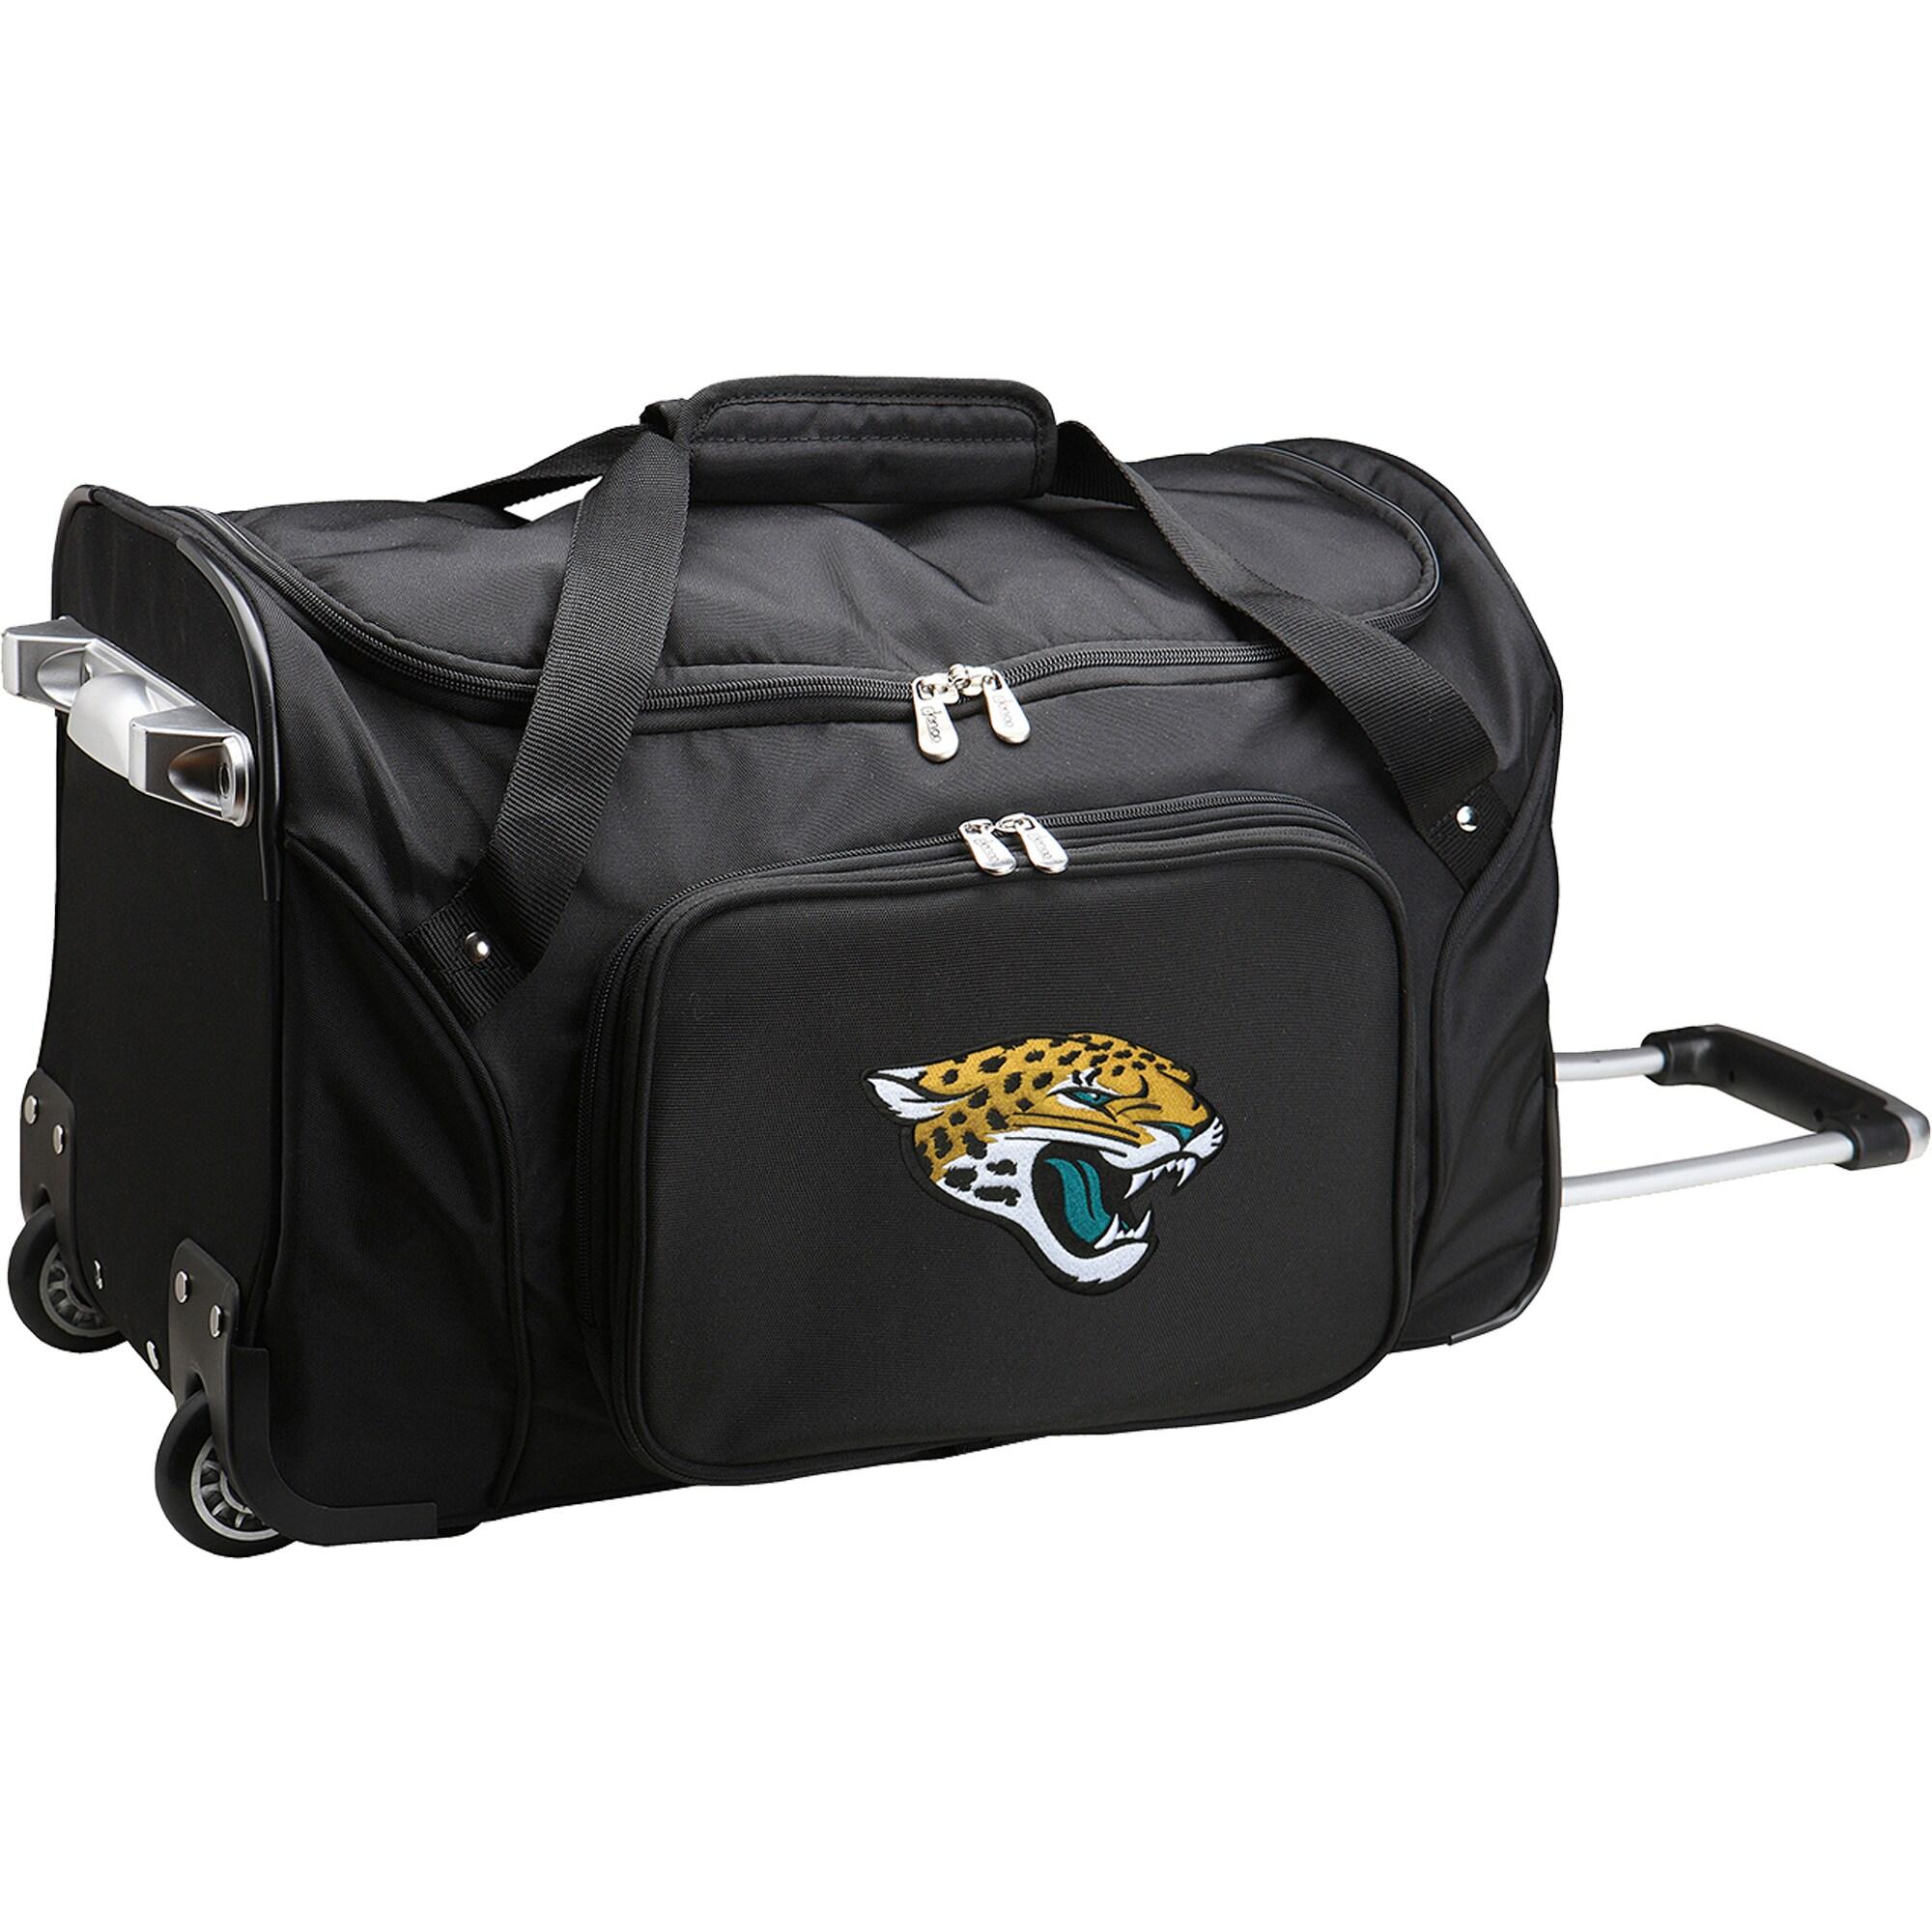 "Jacksonville Jaguars 22"" 2-Wheeled Duffel Bag - Black"